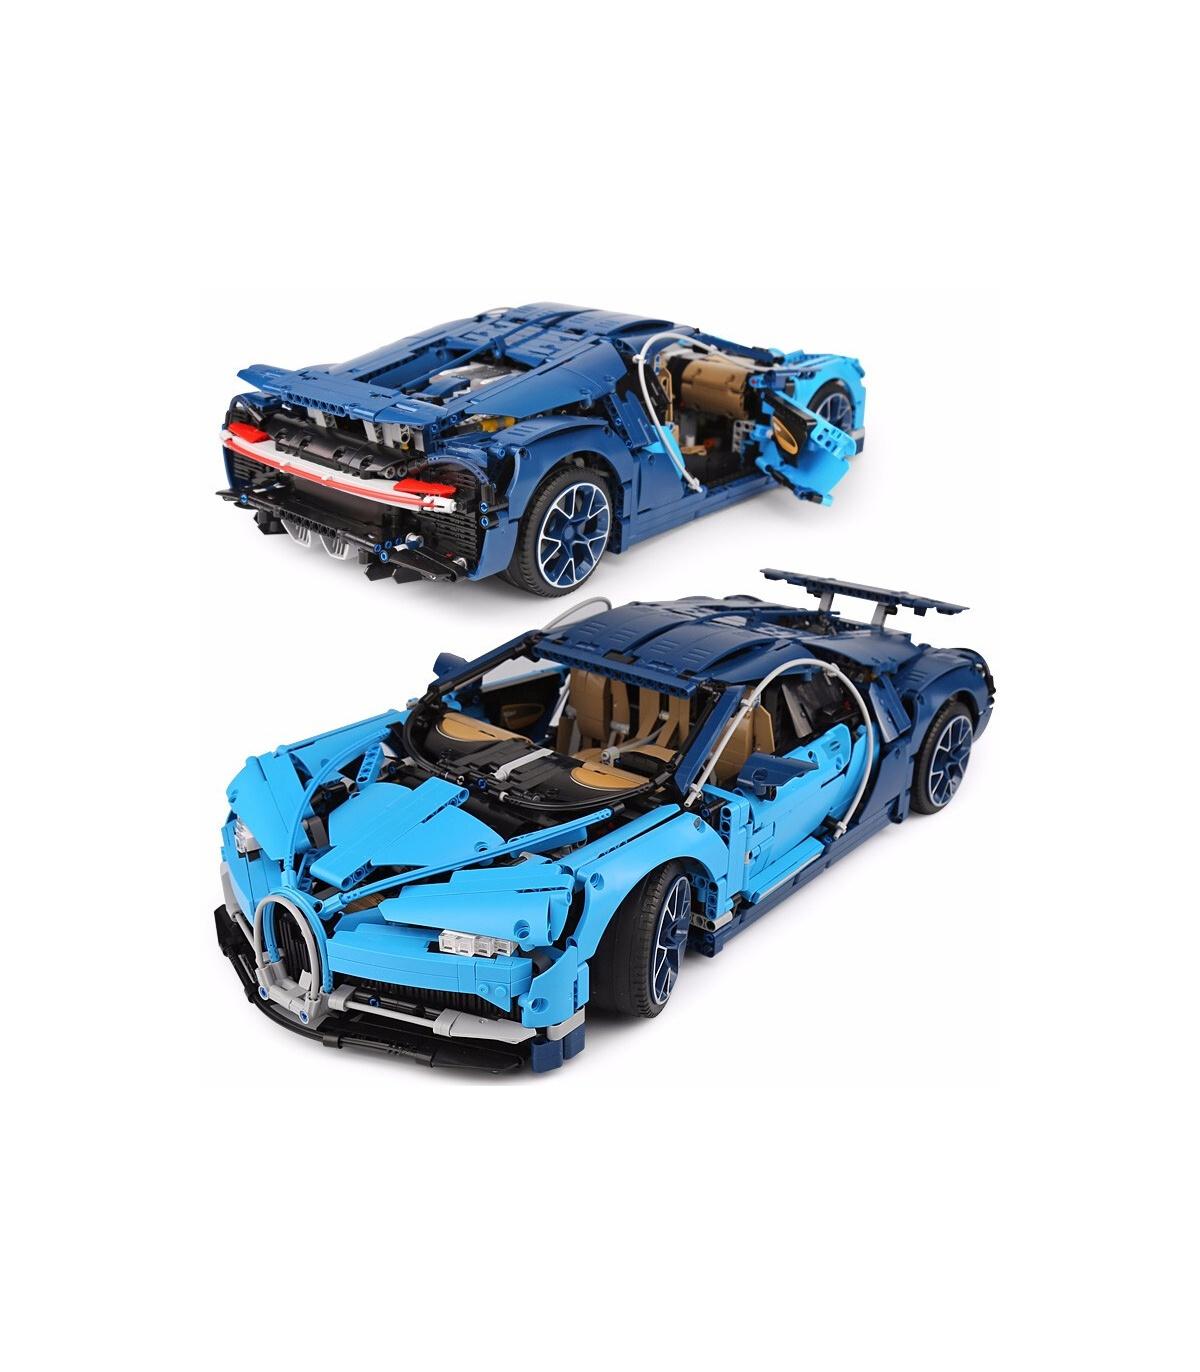 Custom Technology Dream Car Building Bricks Toy Set